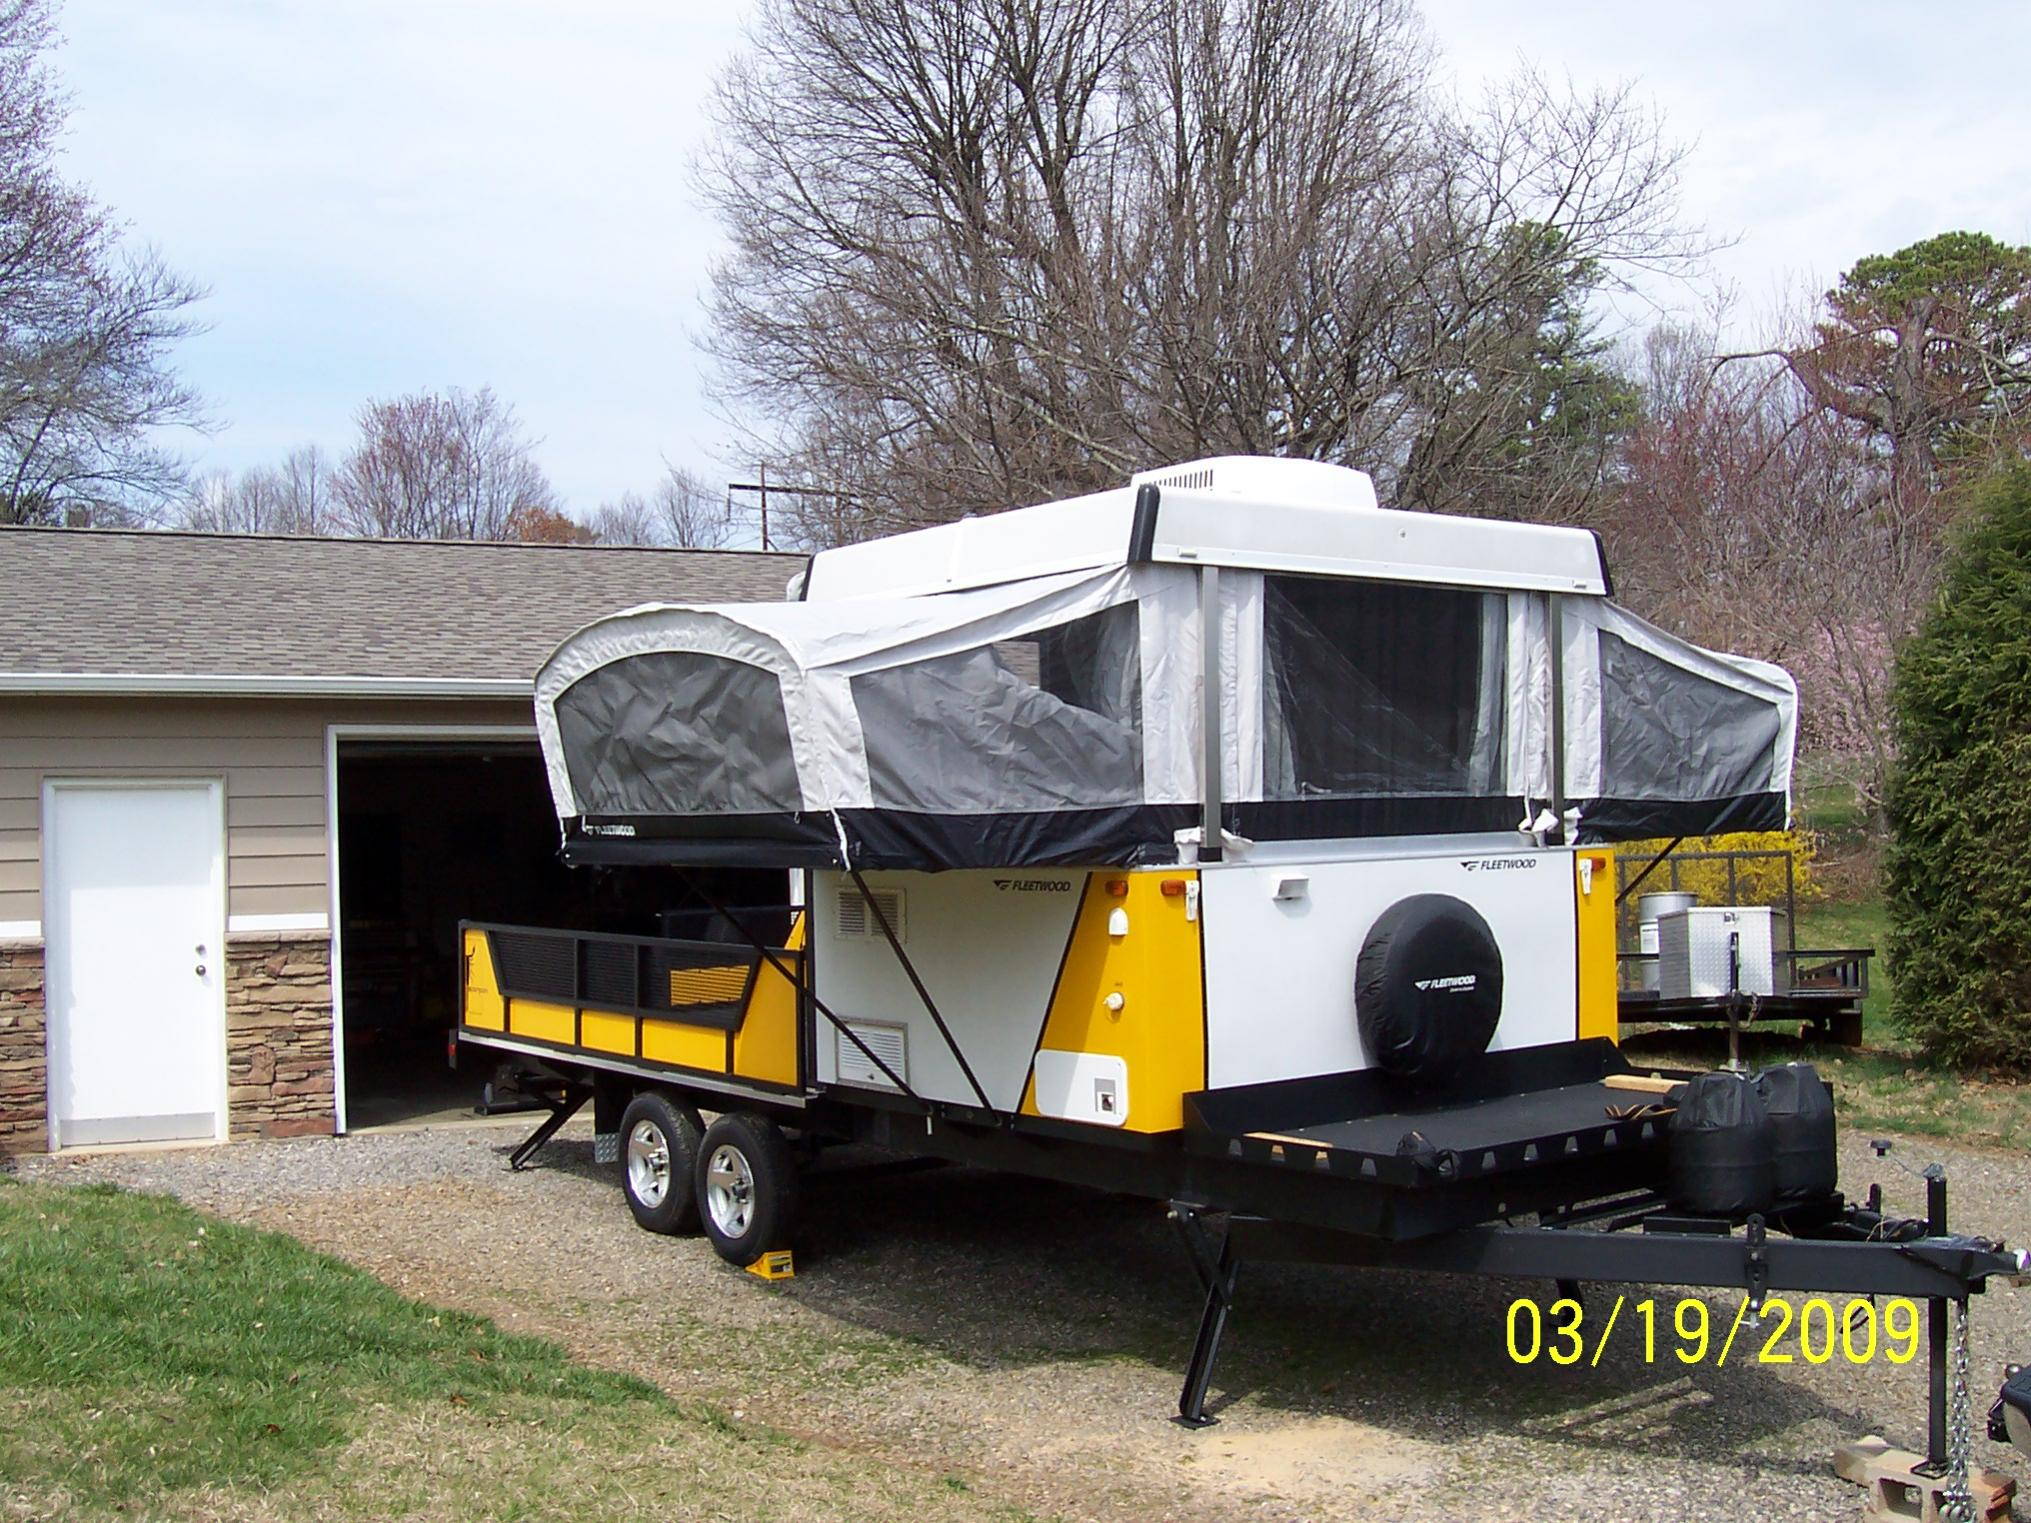 Fleetwood Scorpion S1 Toy Hauler Camper 100 1446